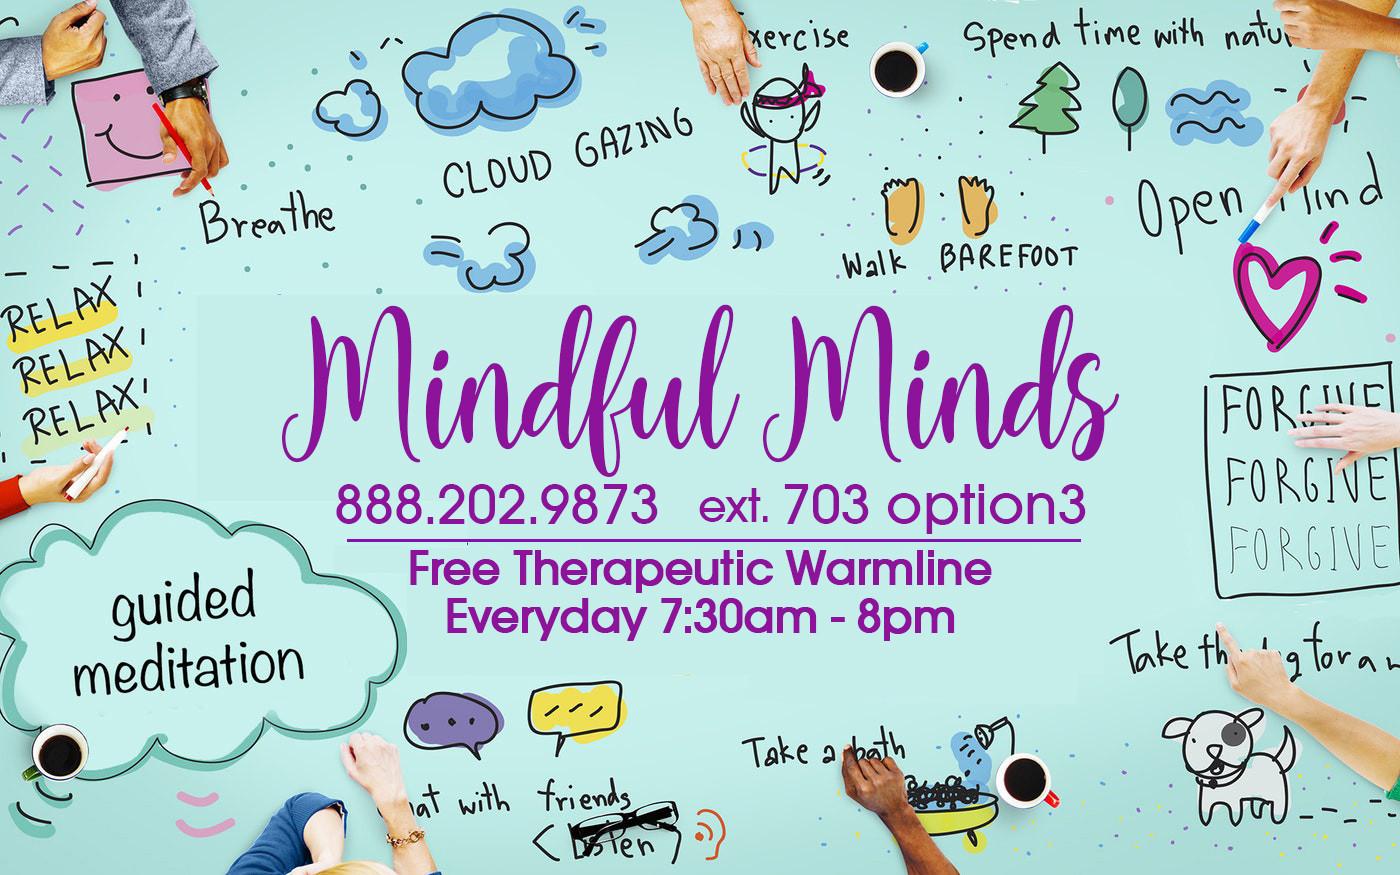 Mindful-minds-tamme2.jpg